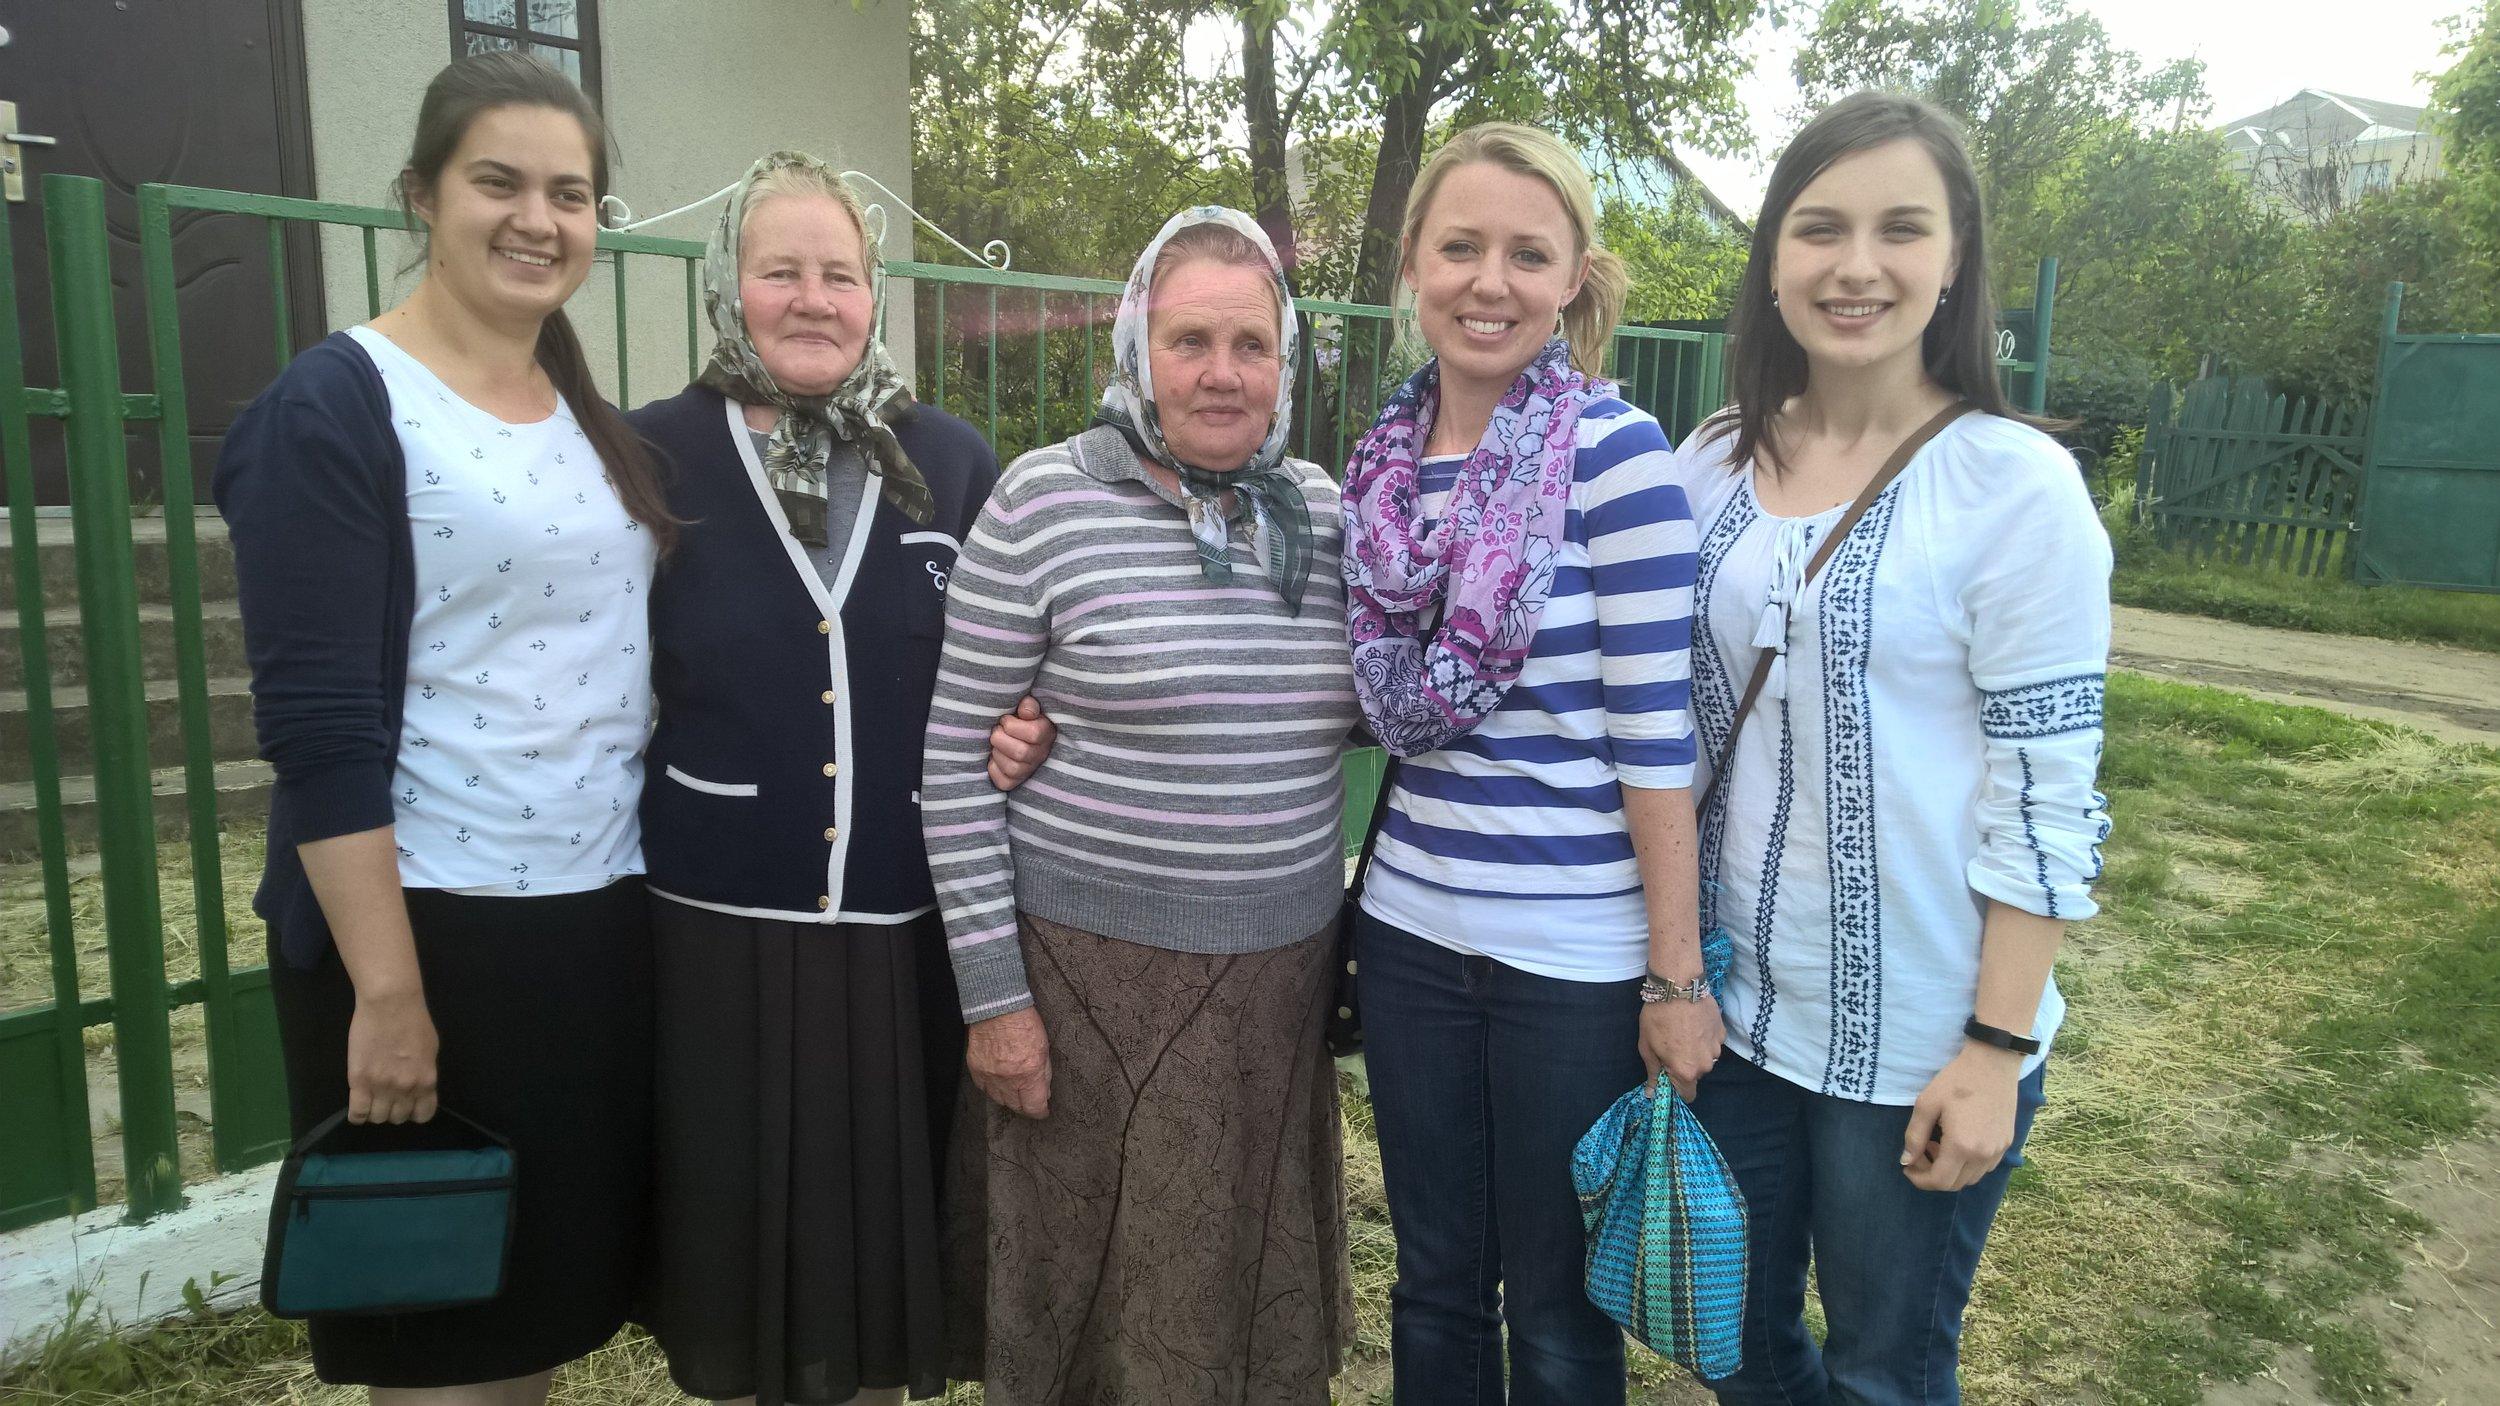 Village ladies Natasha, Anna and Pasha chat with my daughter Ruth and granddaughter Naomi.